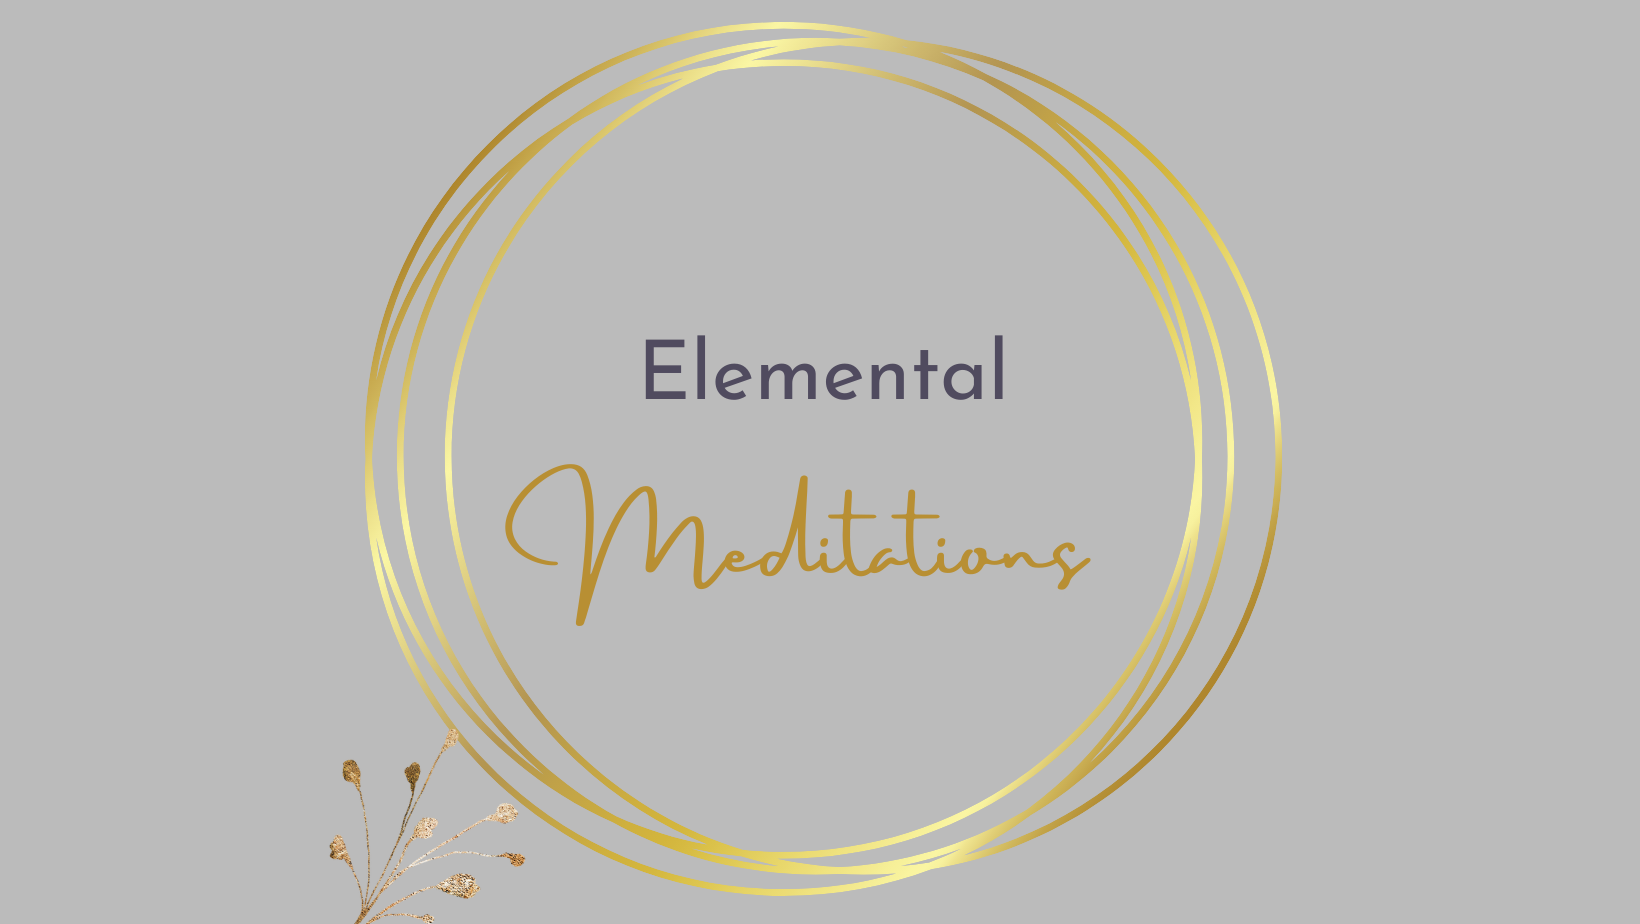 Elemental Mediations